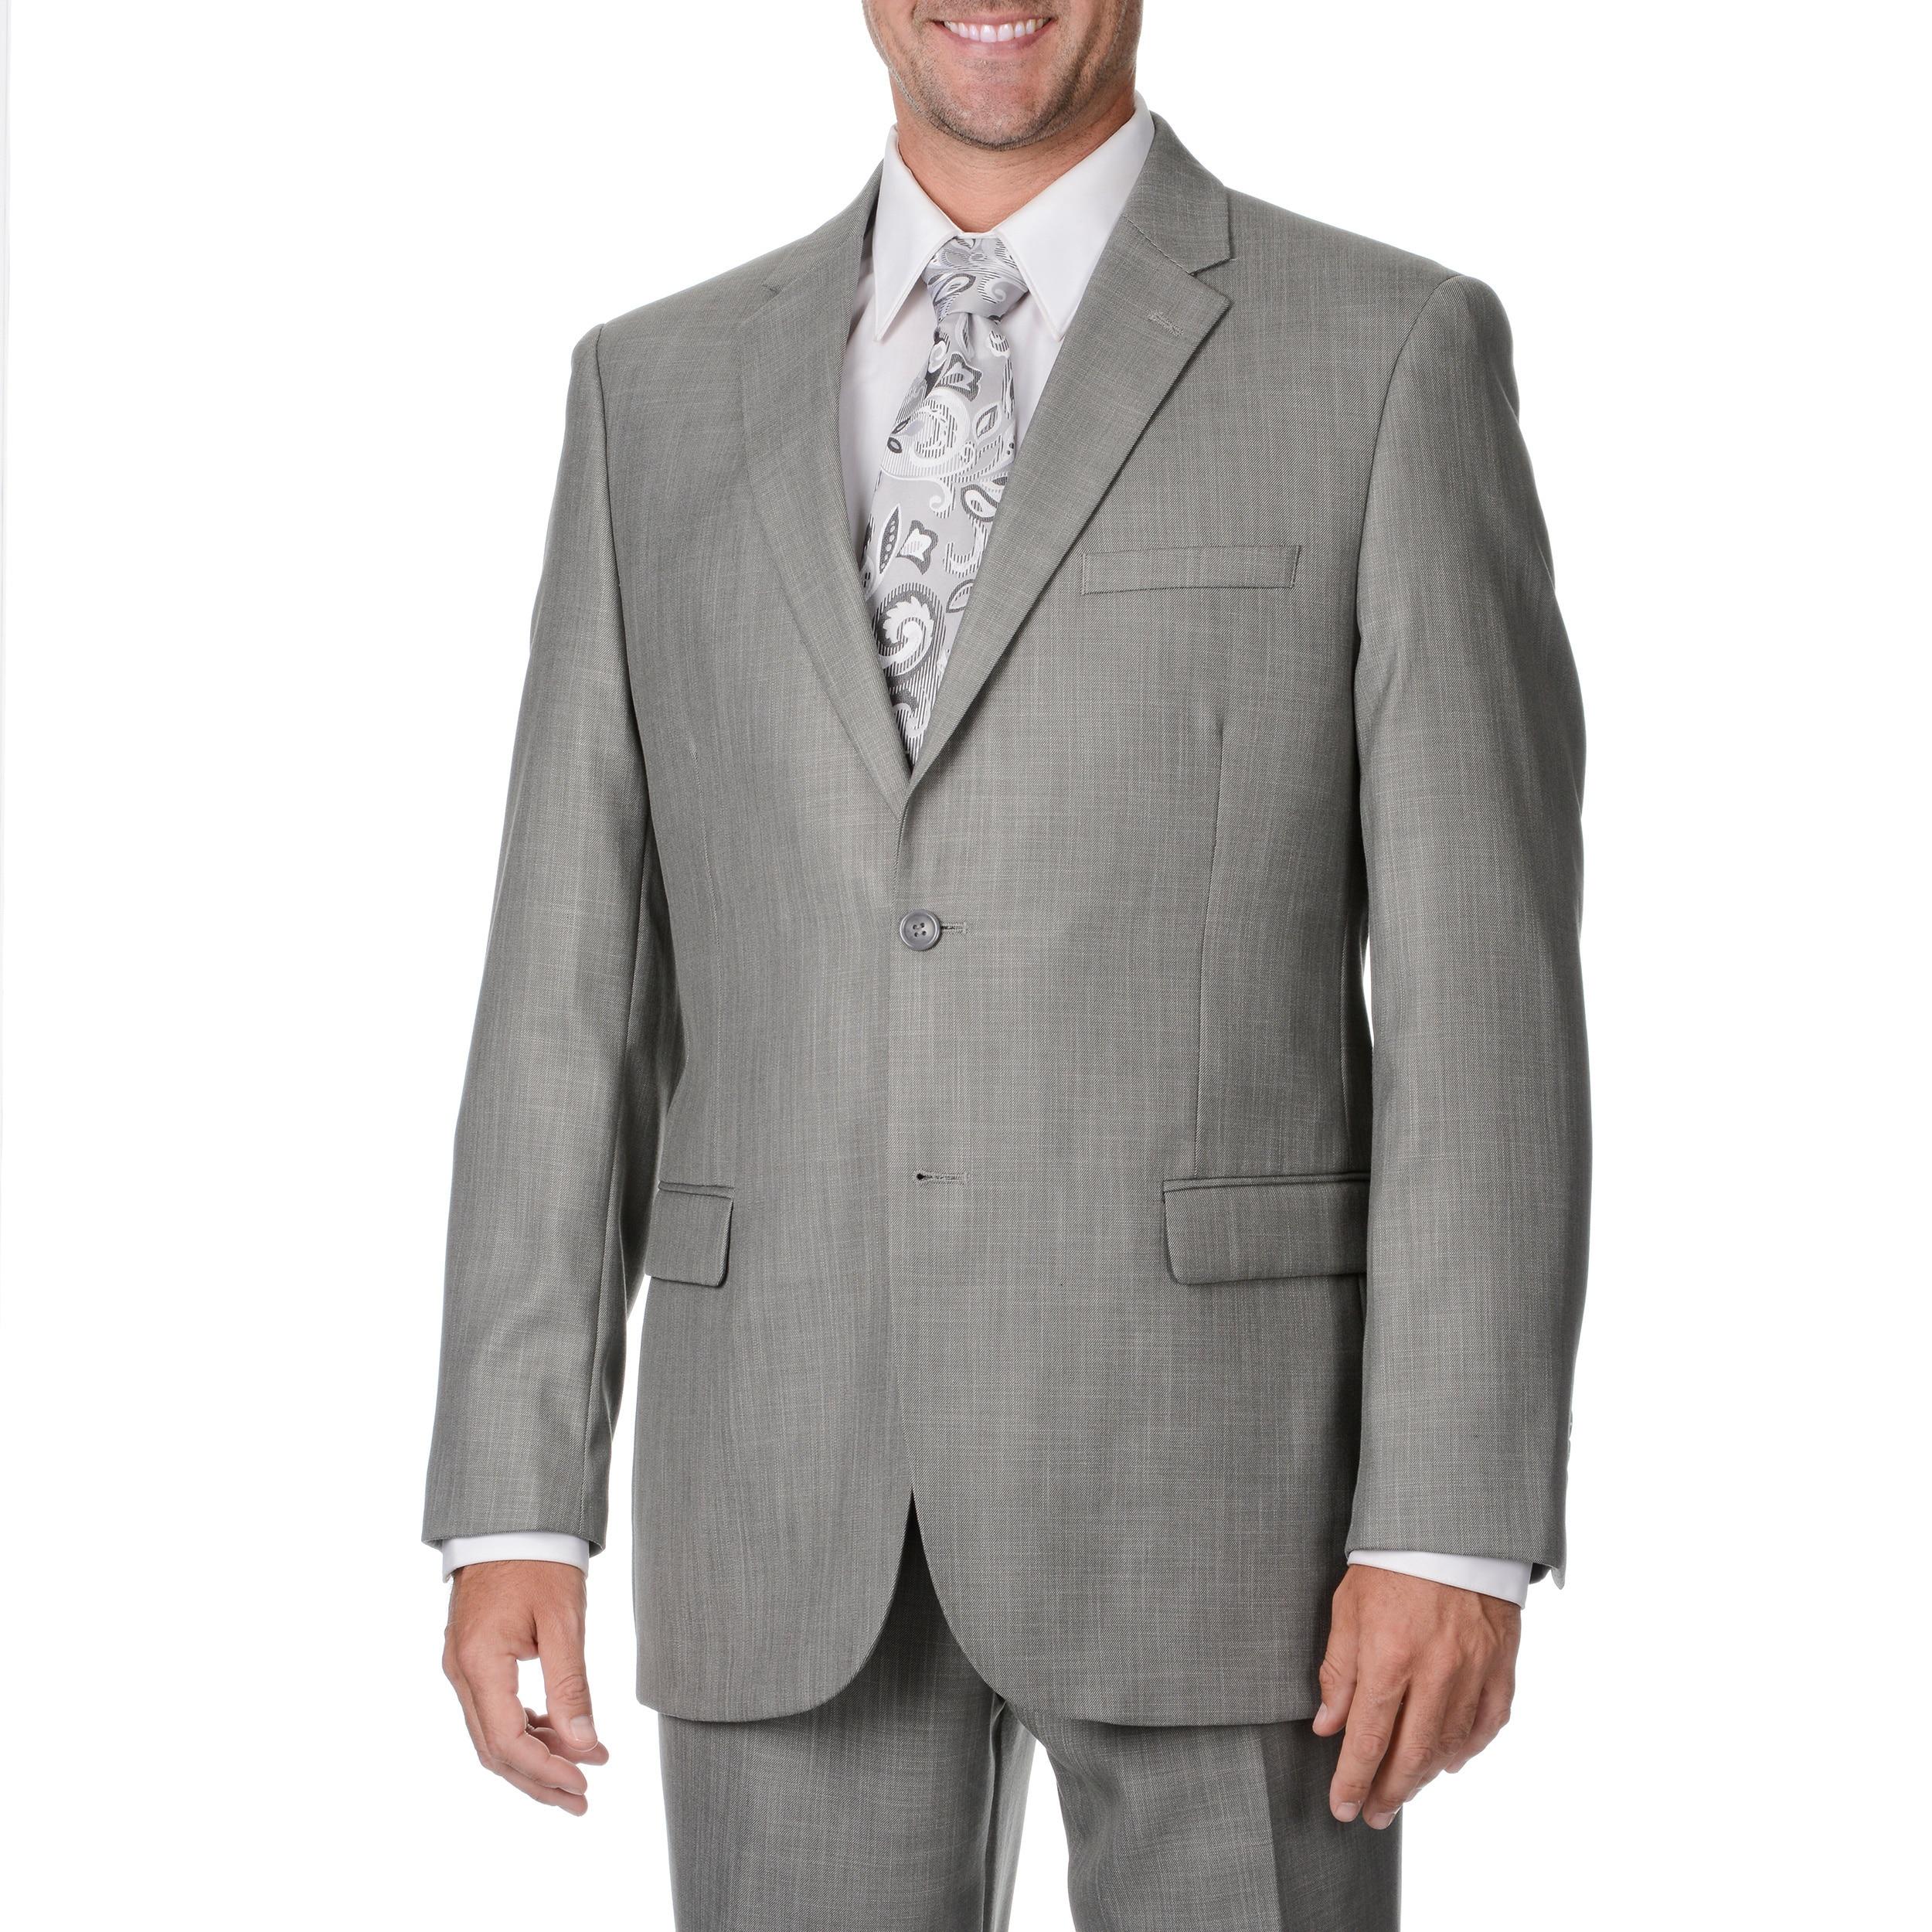 Overstock.com Caravelli Italy Men's Light Grey 2-piece Suit at Sears.com